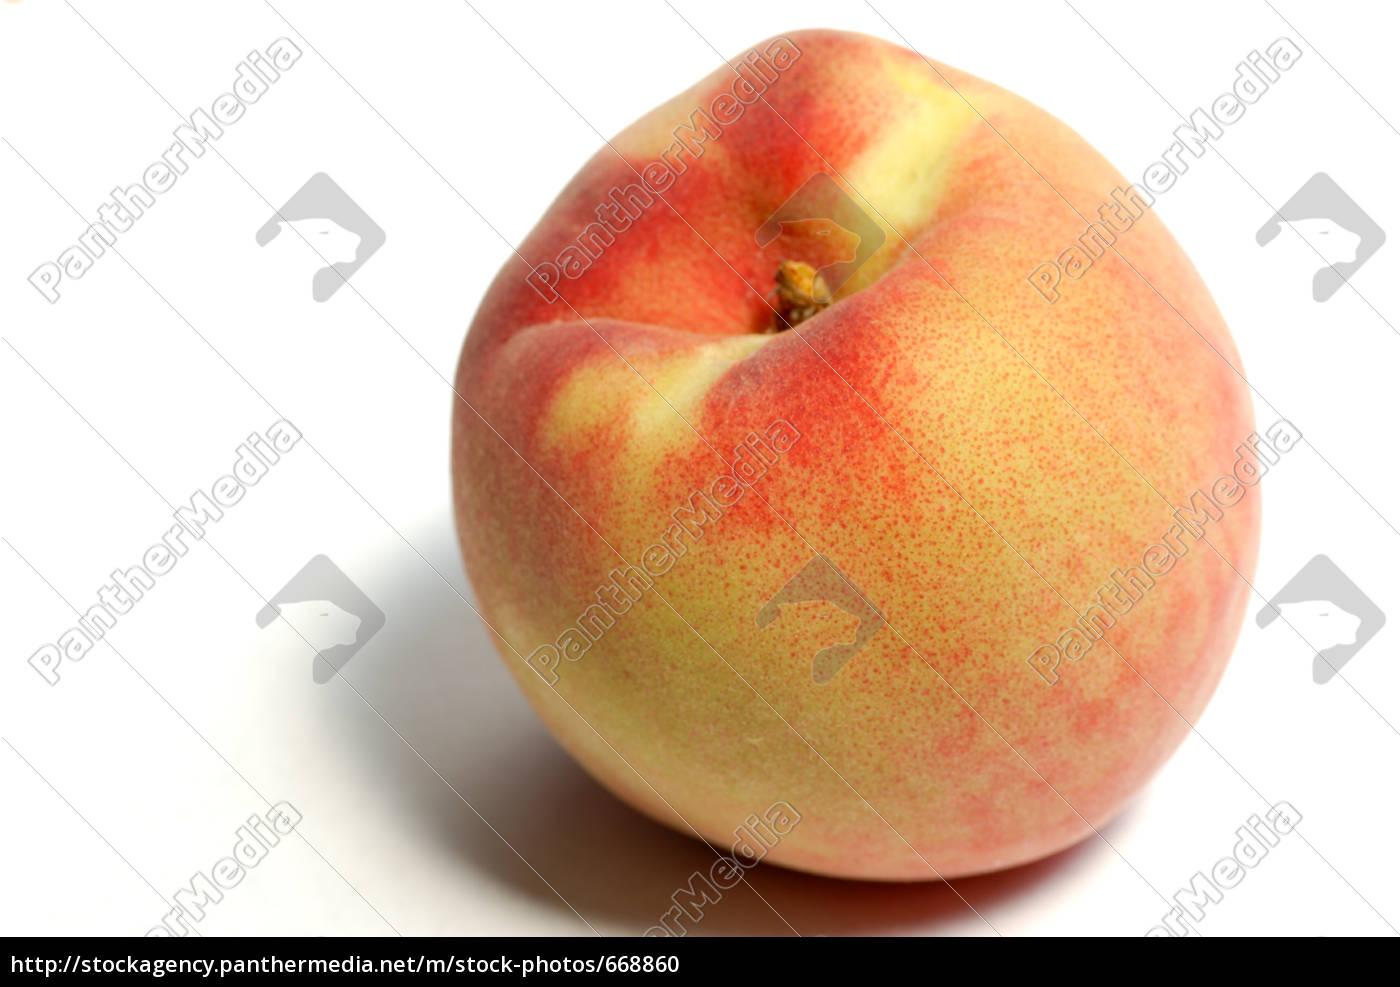 peach, laterally - 668860